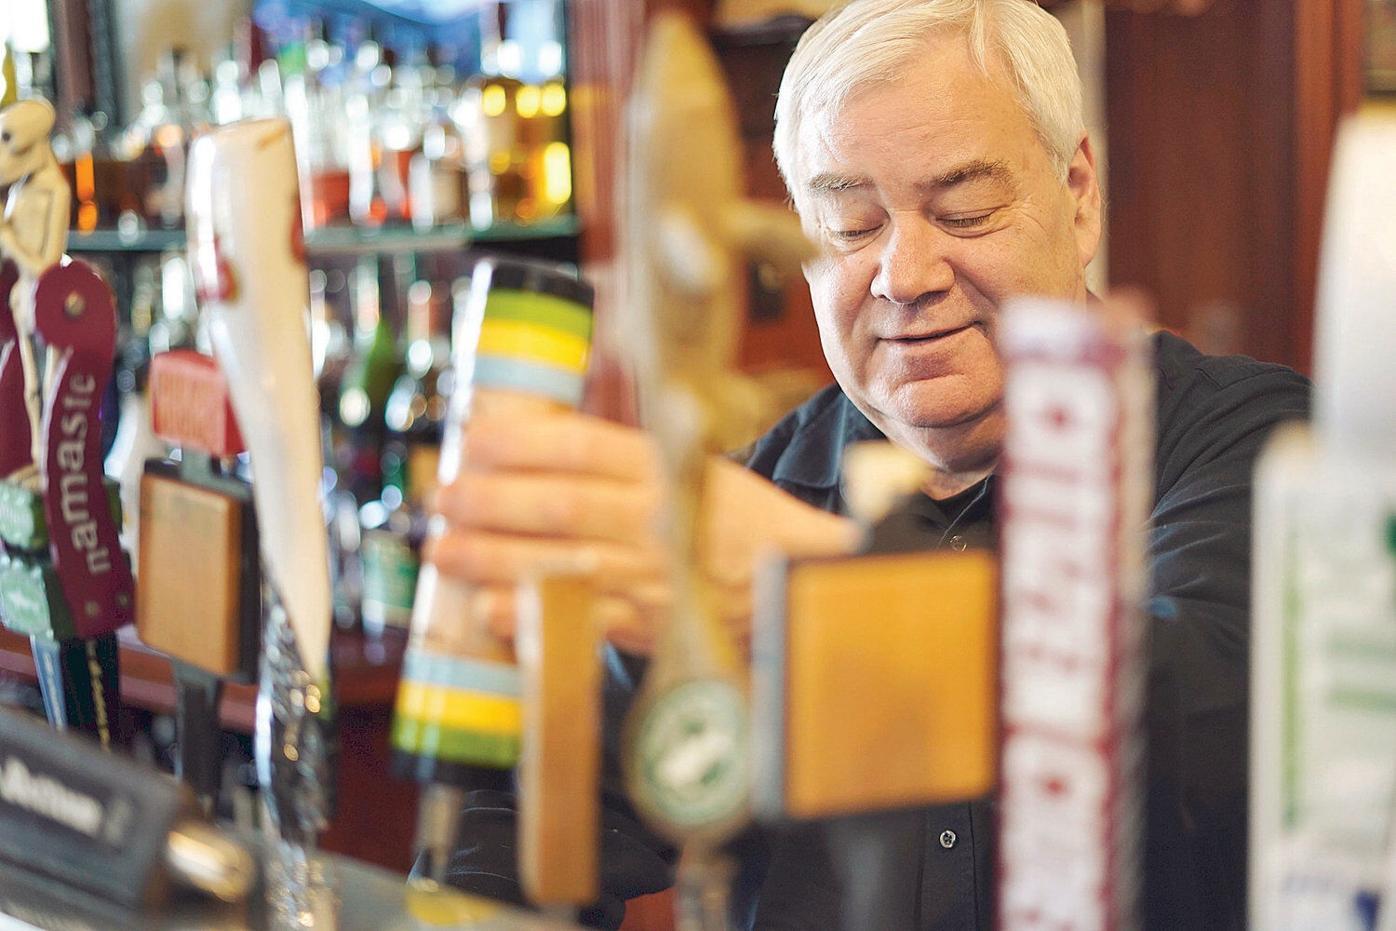 For Rainbow Restaurant bartender Paul Ruscio, it's all a matter of preparation